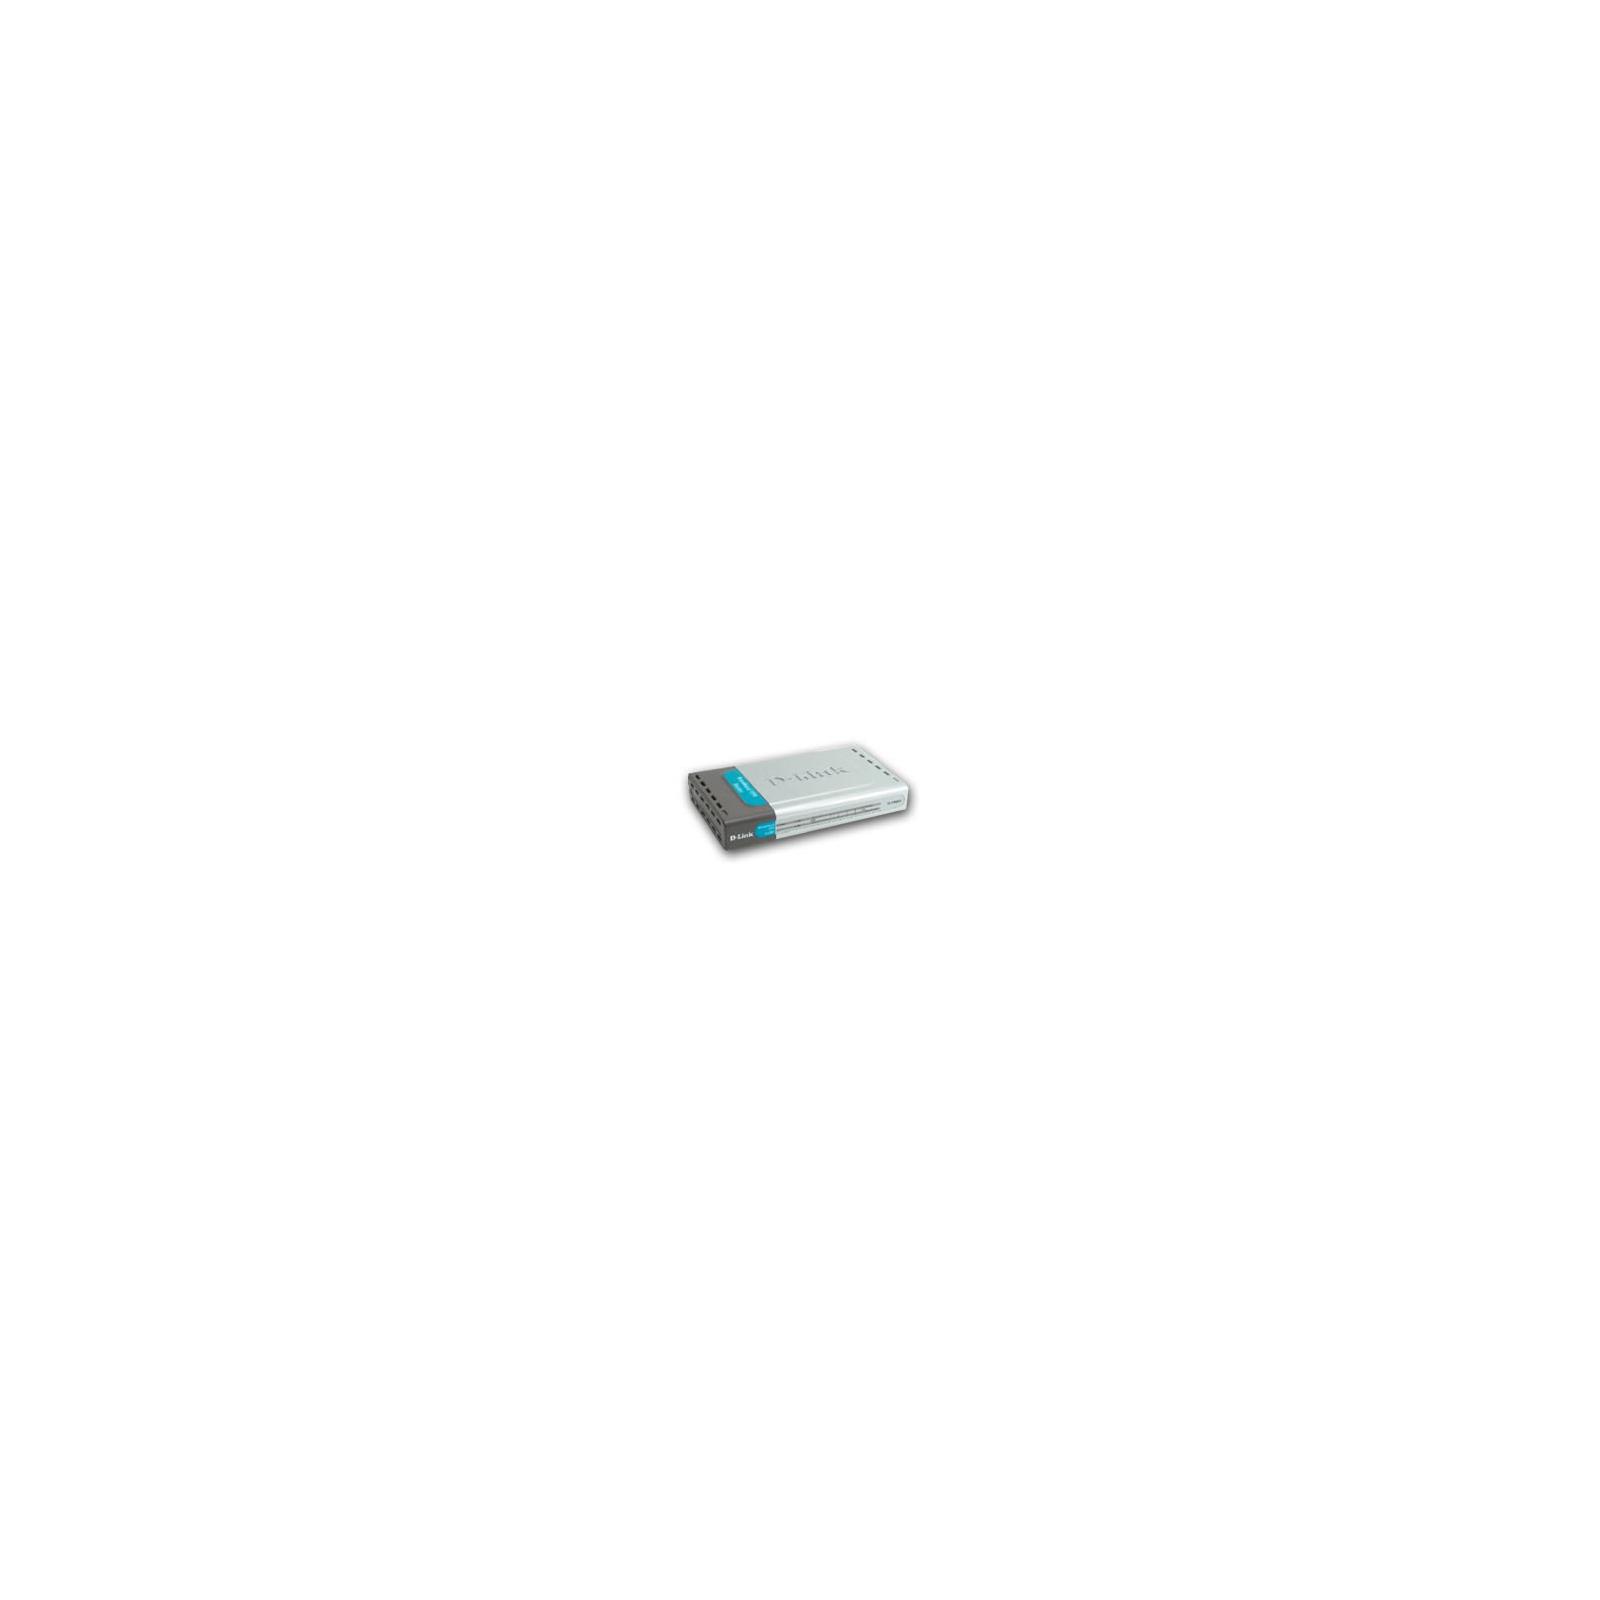 Маршрутизатор D-Link DI-804HV